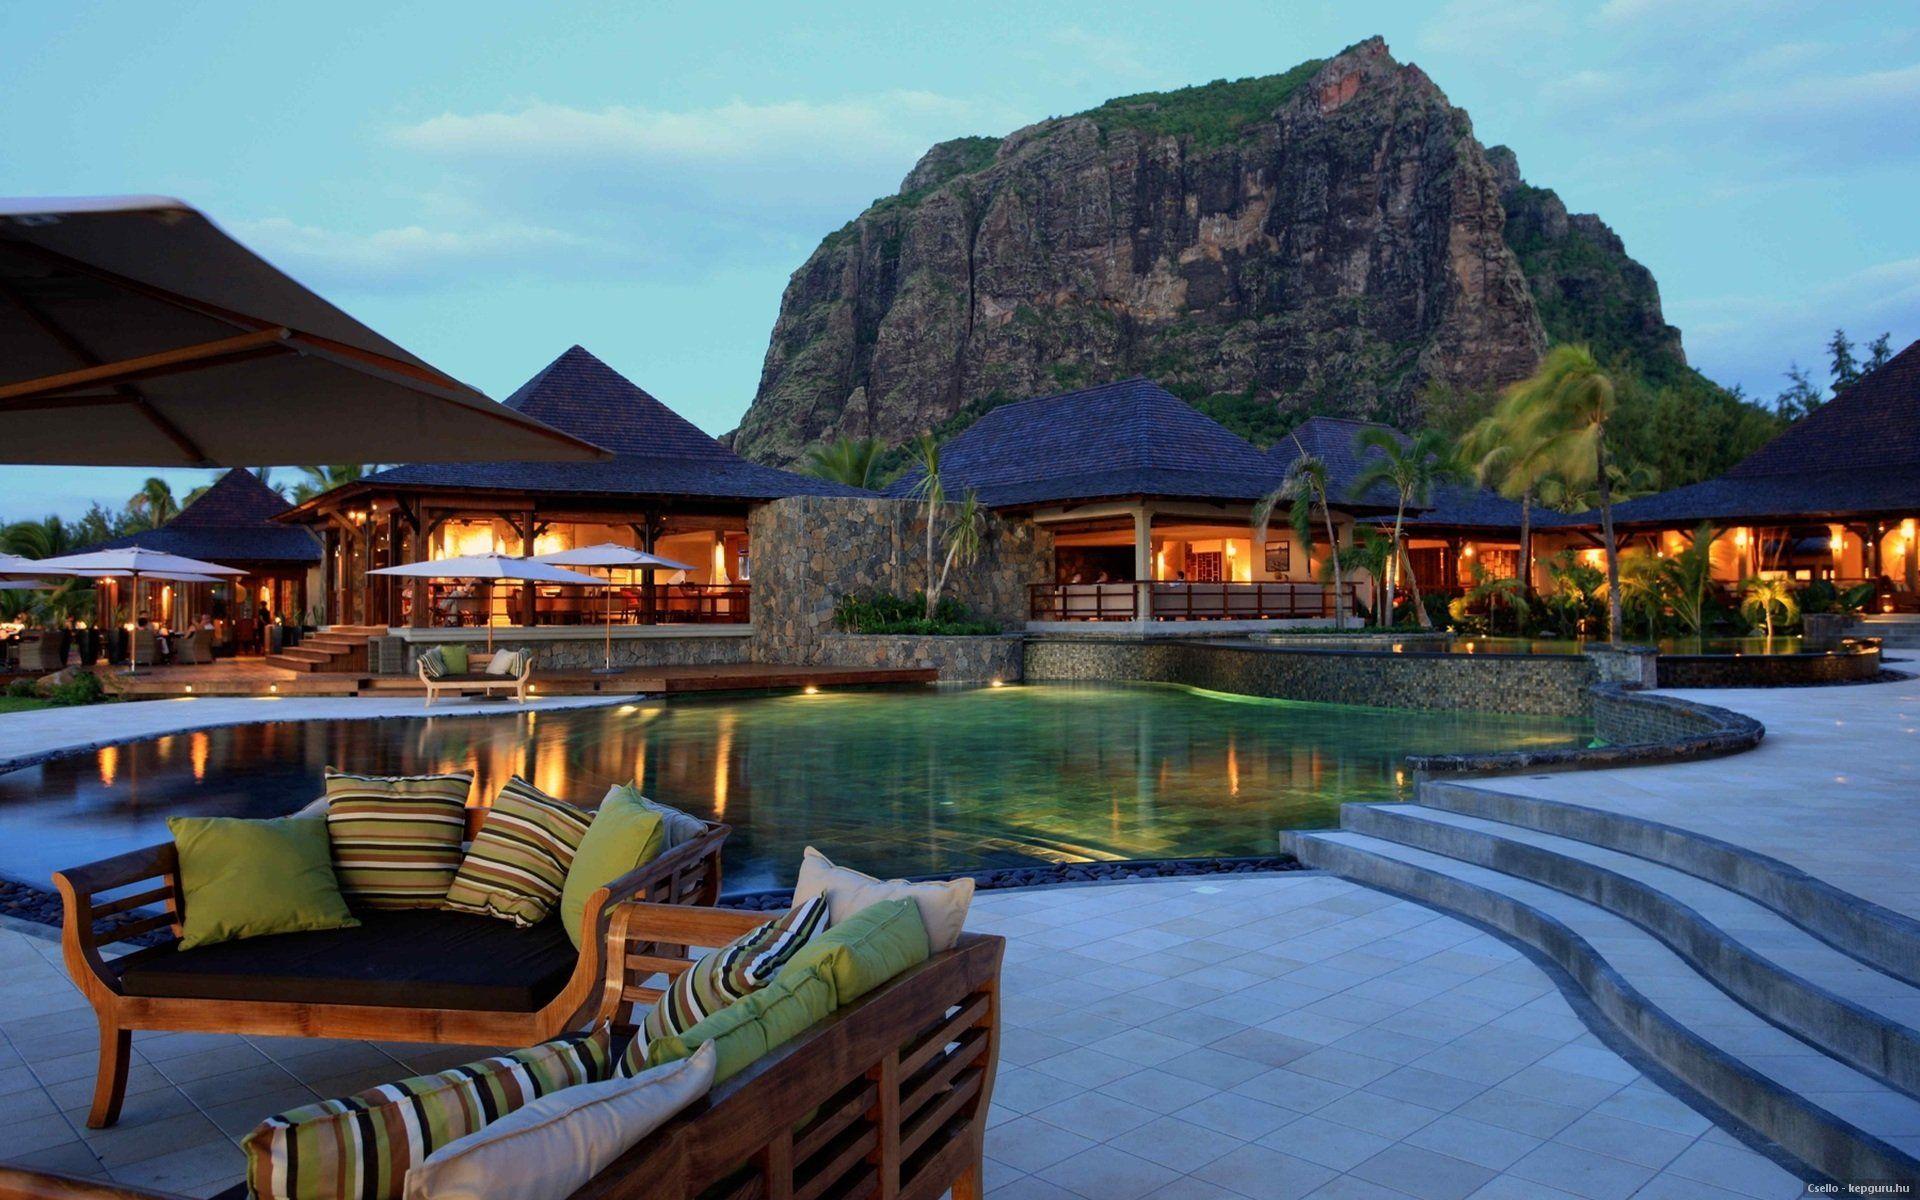 bali indonesia 33 hd wallpaper wallallies destinations pinterest le maurice hotel. Black Bedroom Furniture Sets. Home Design Ideas